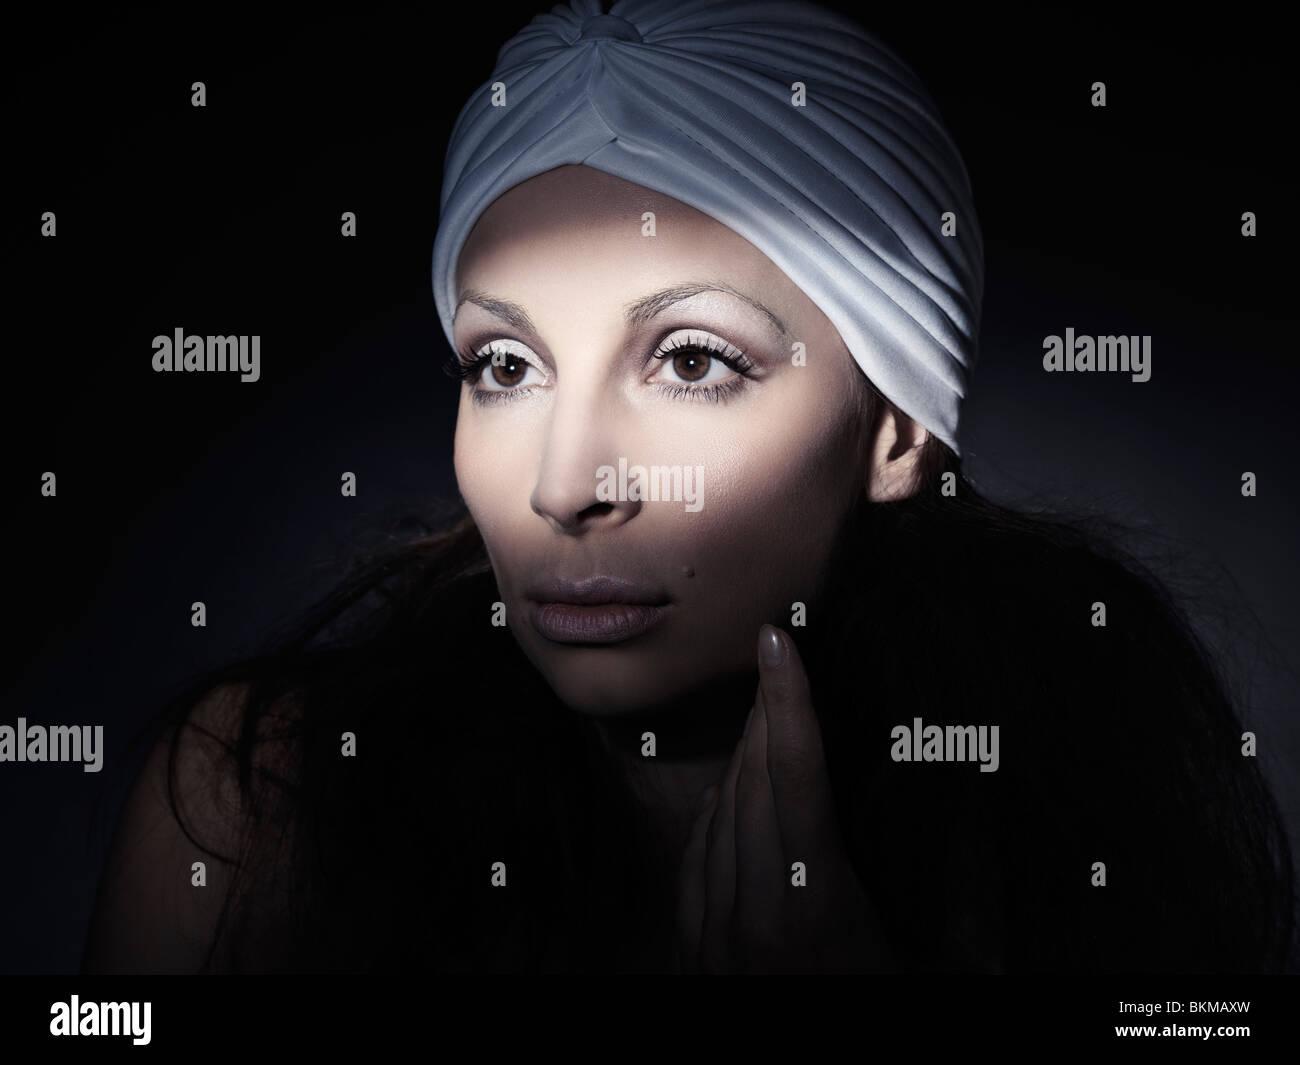 Light falling on a beautiful woman face artistic portrait - Stock Image